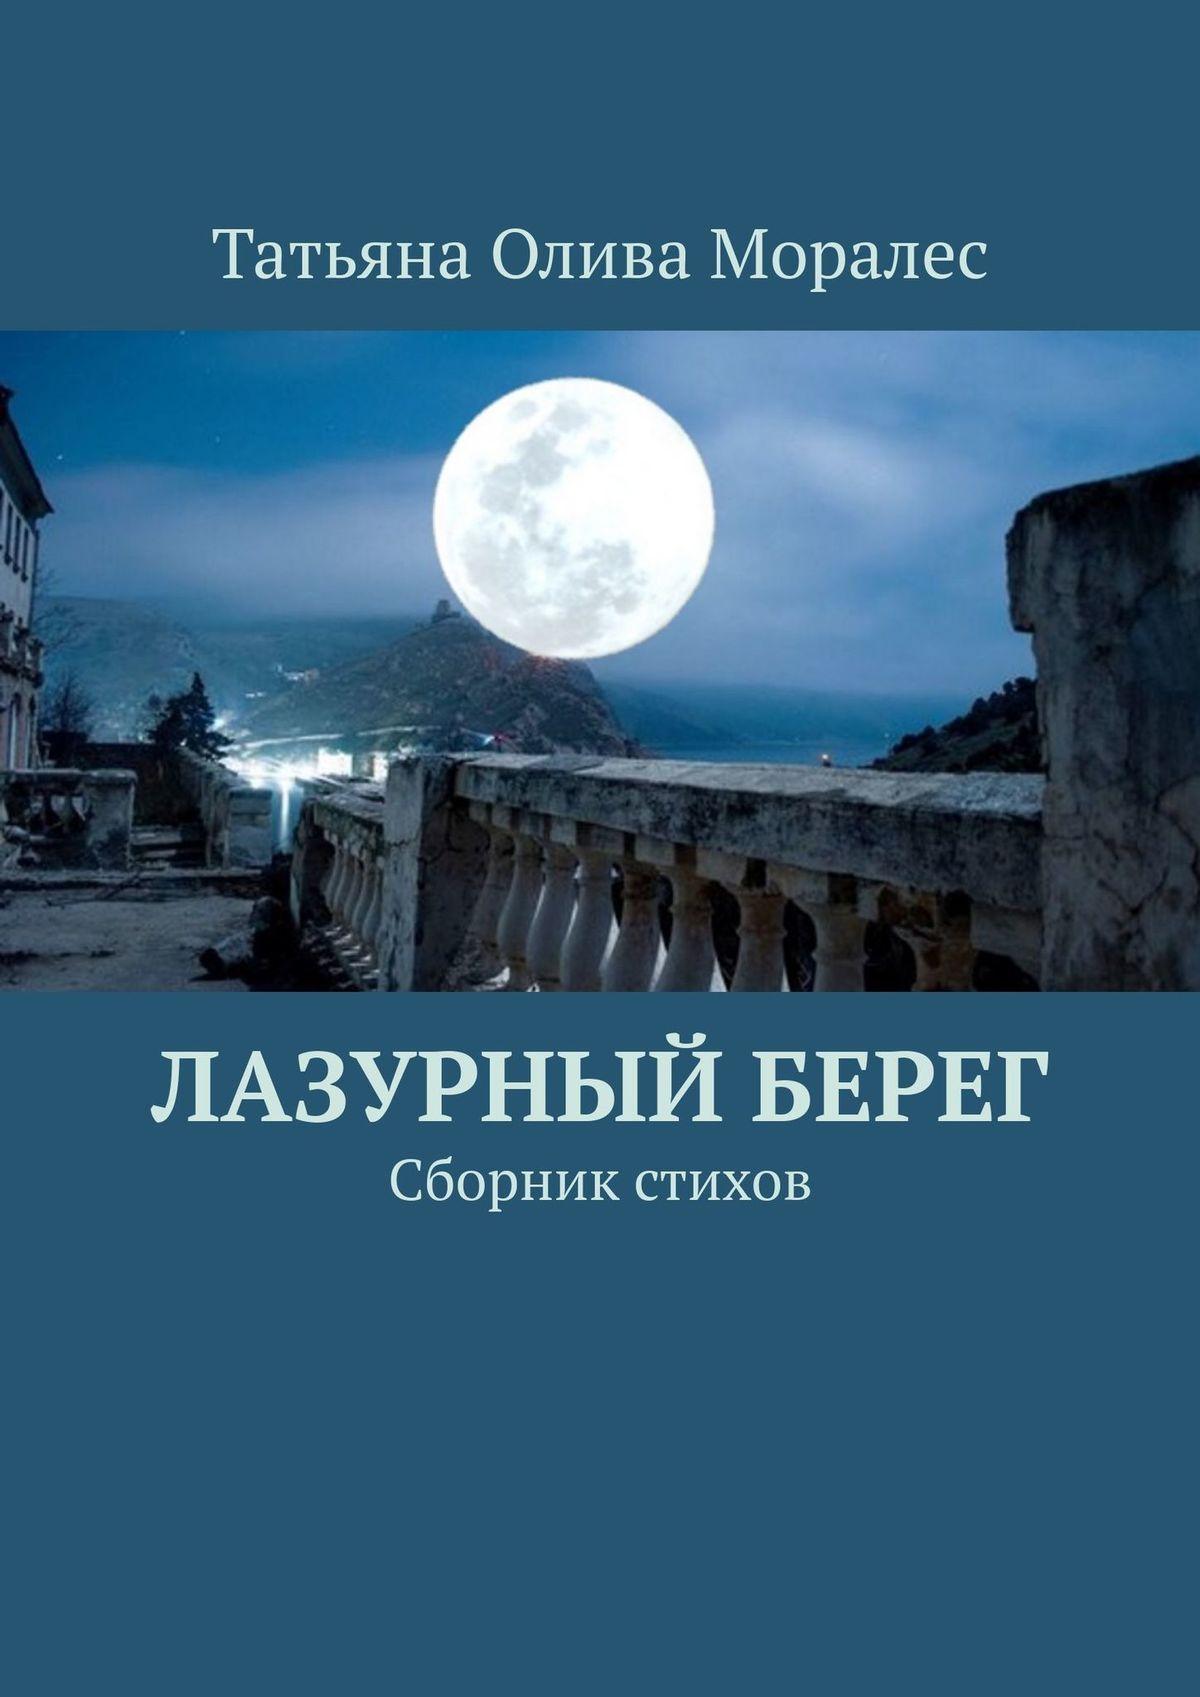 Татьяна Олива Моралес Лазурный берег. Сборник стихов цена 2017